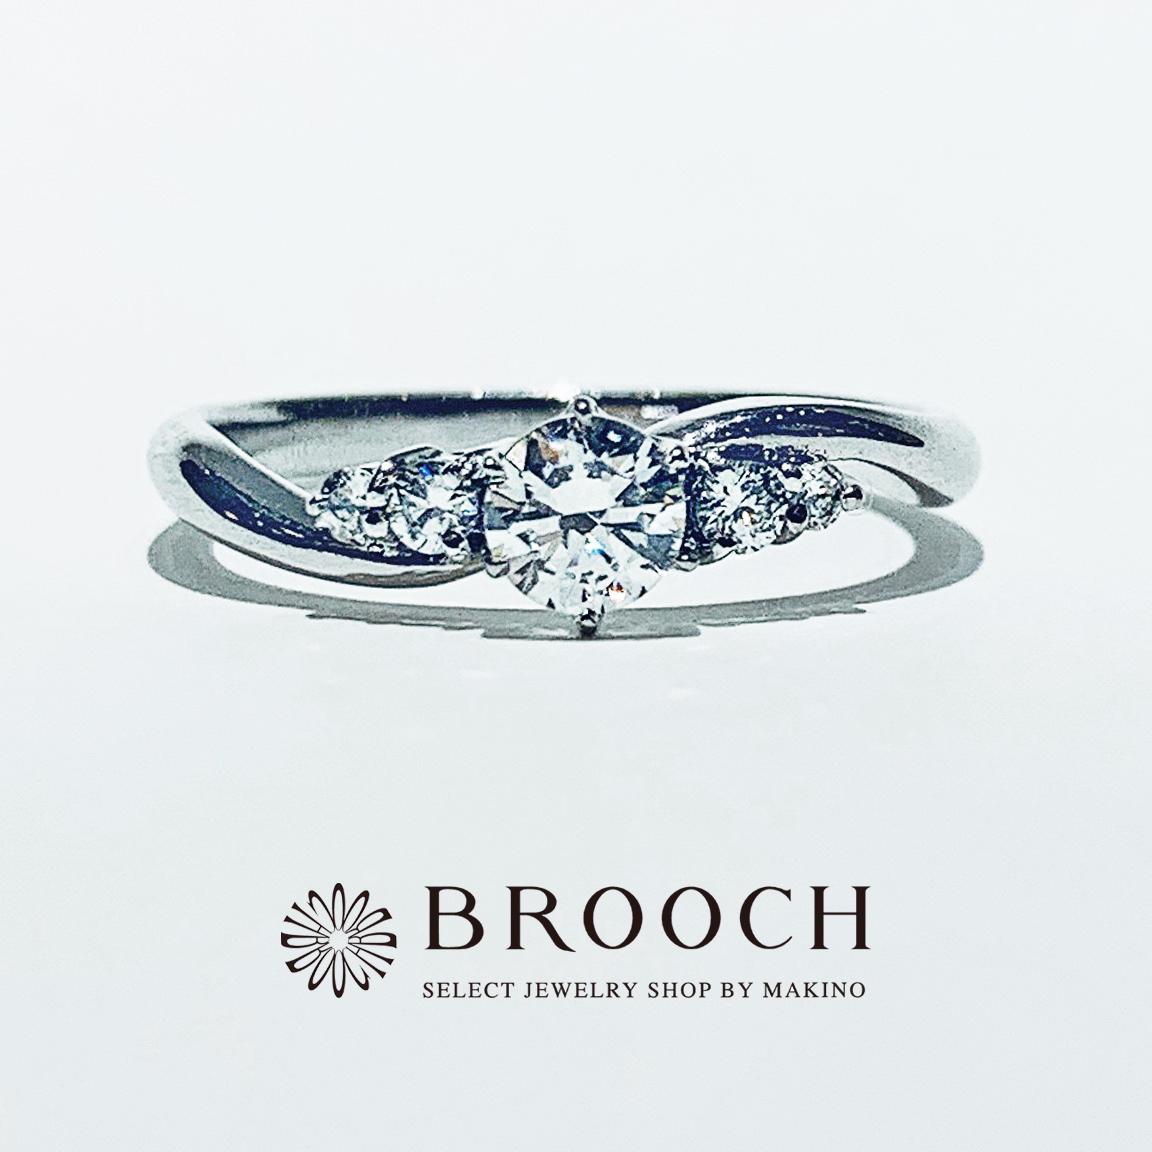 BROOCH 婚約指輪 エンゲージリング かわいい 両サイドメレウェーブデザイン